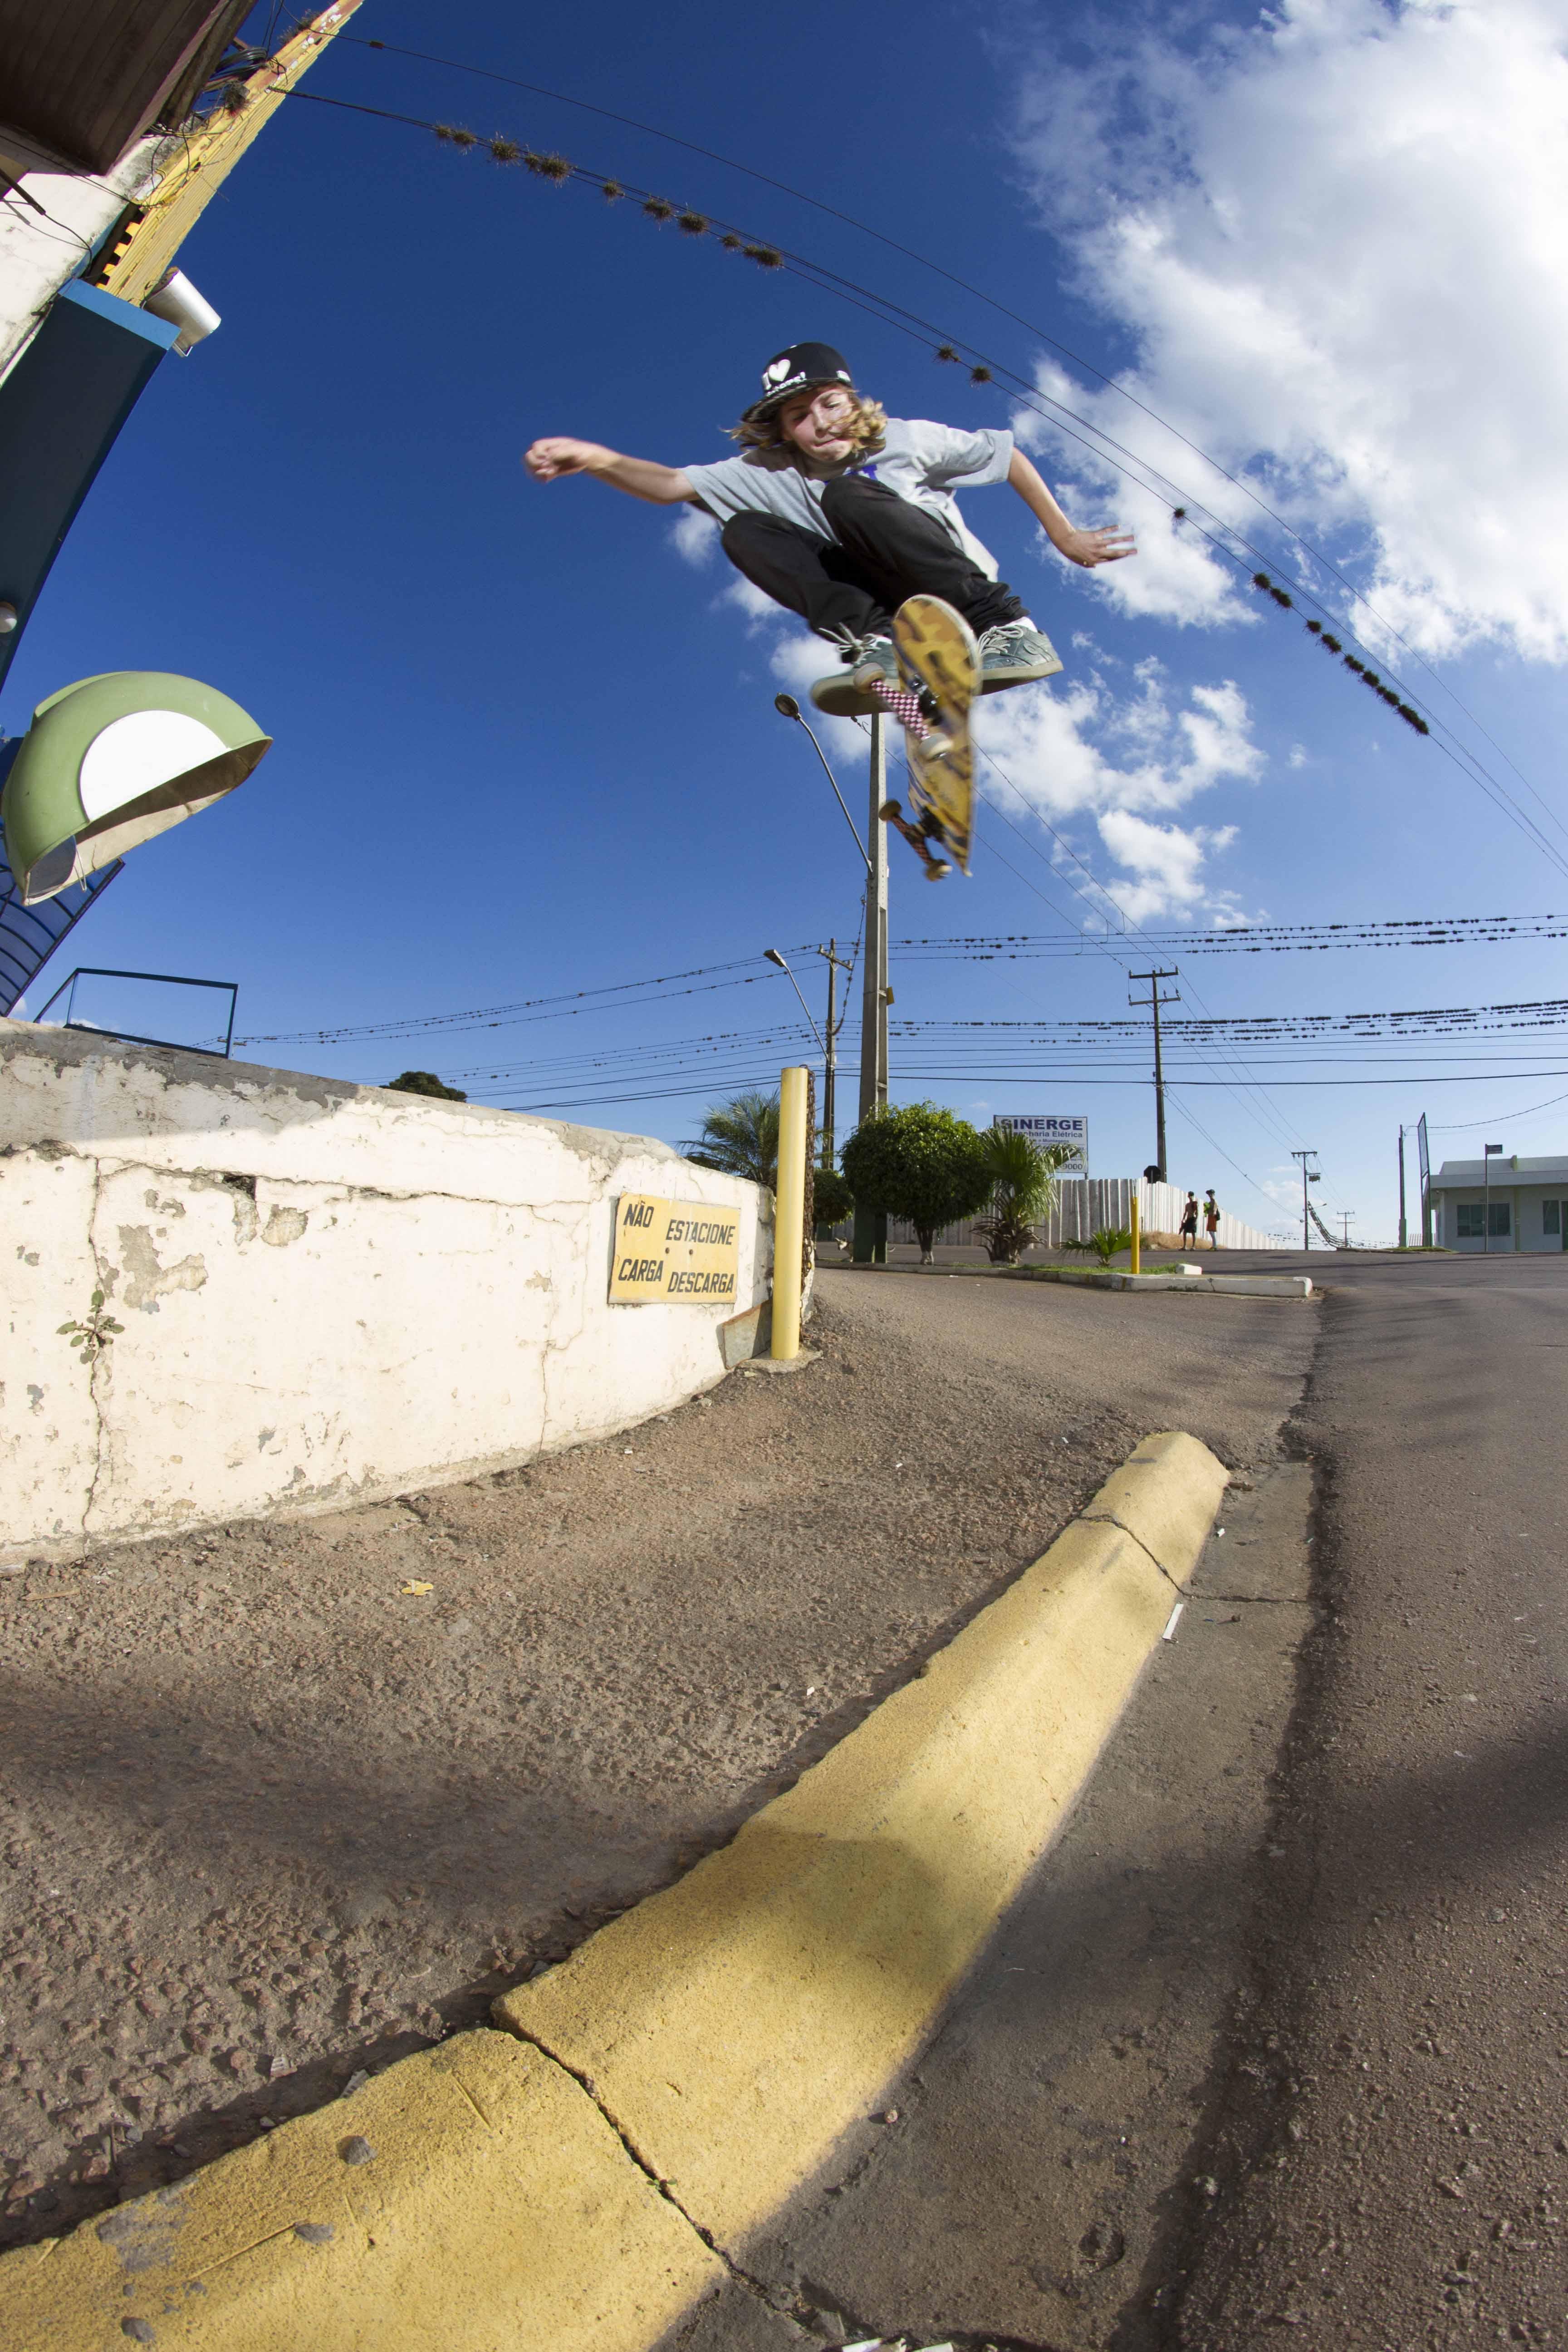 James - Hard Flip